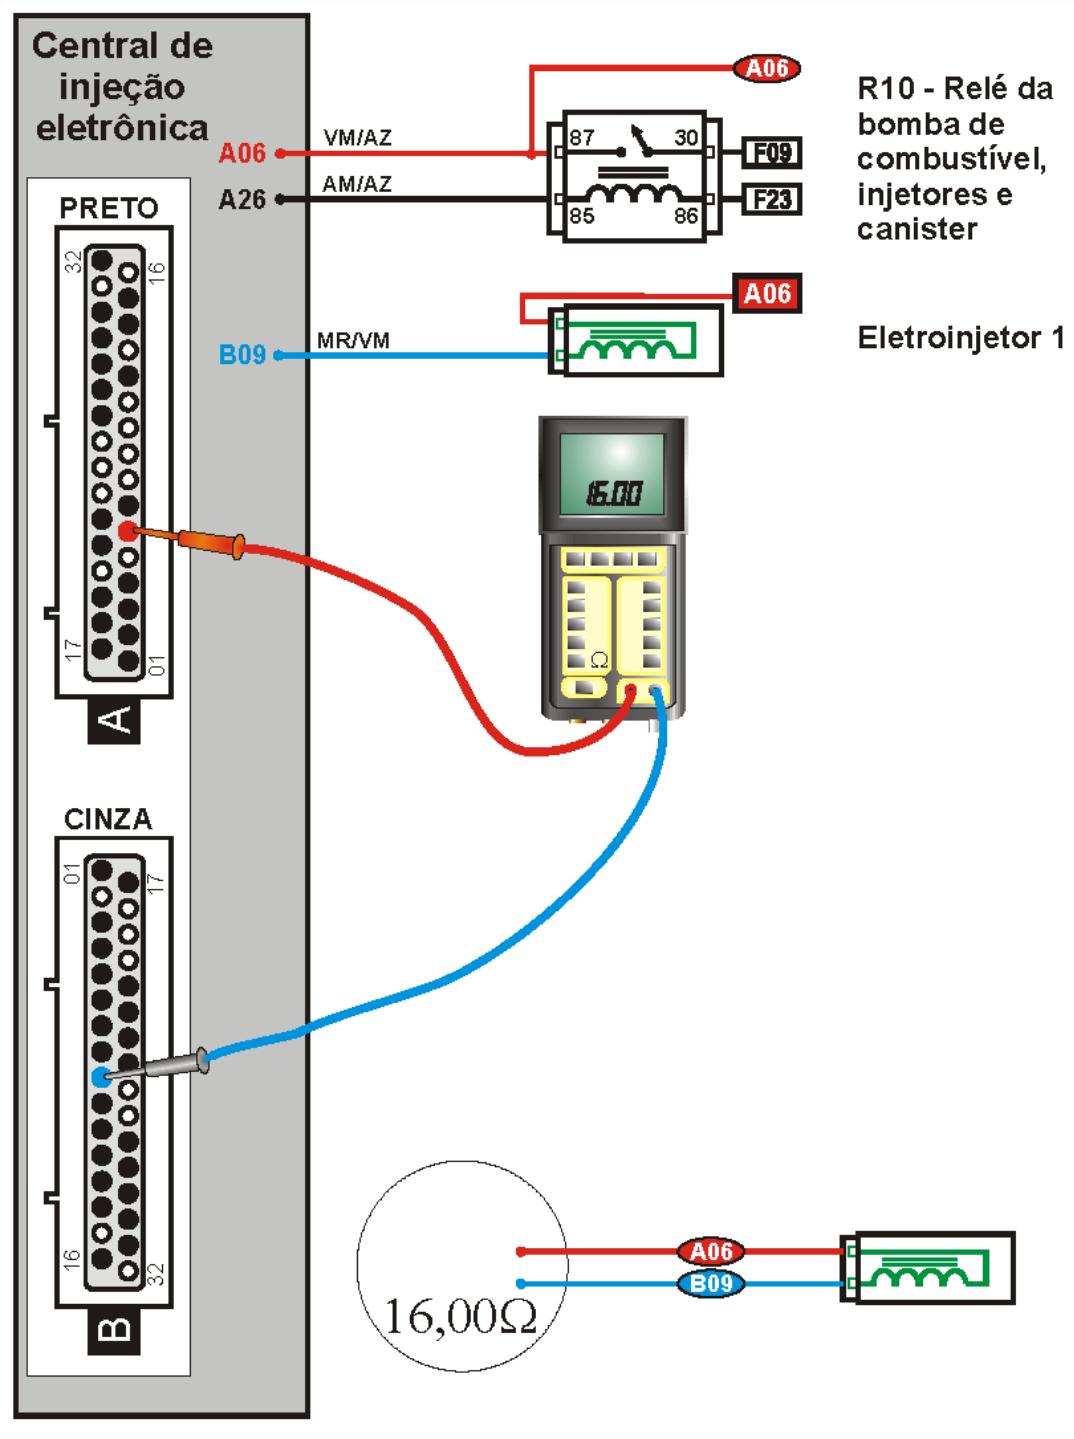 Medindo a resistência elétrica do indutor